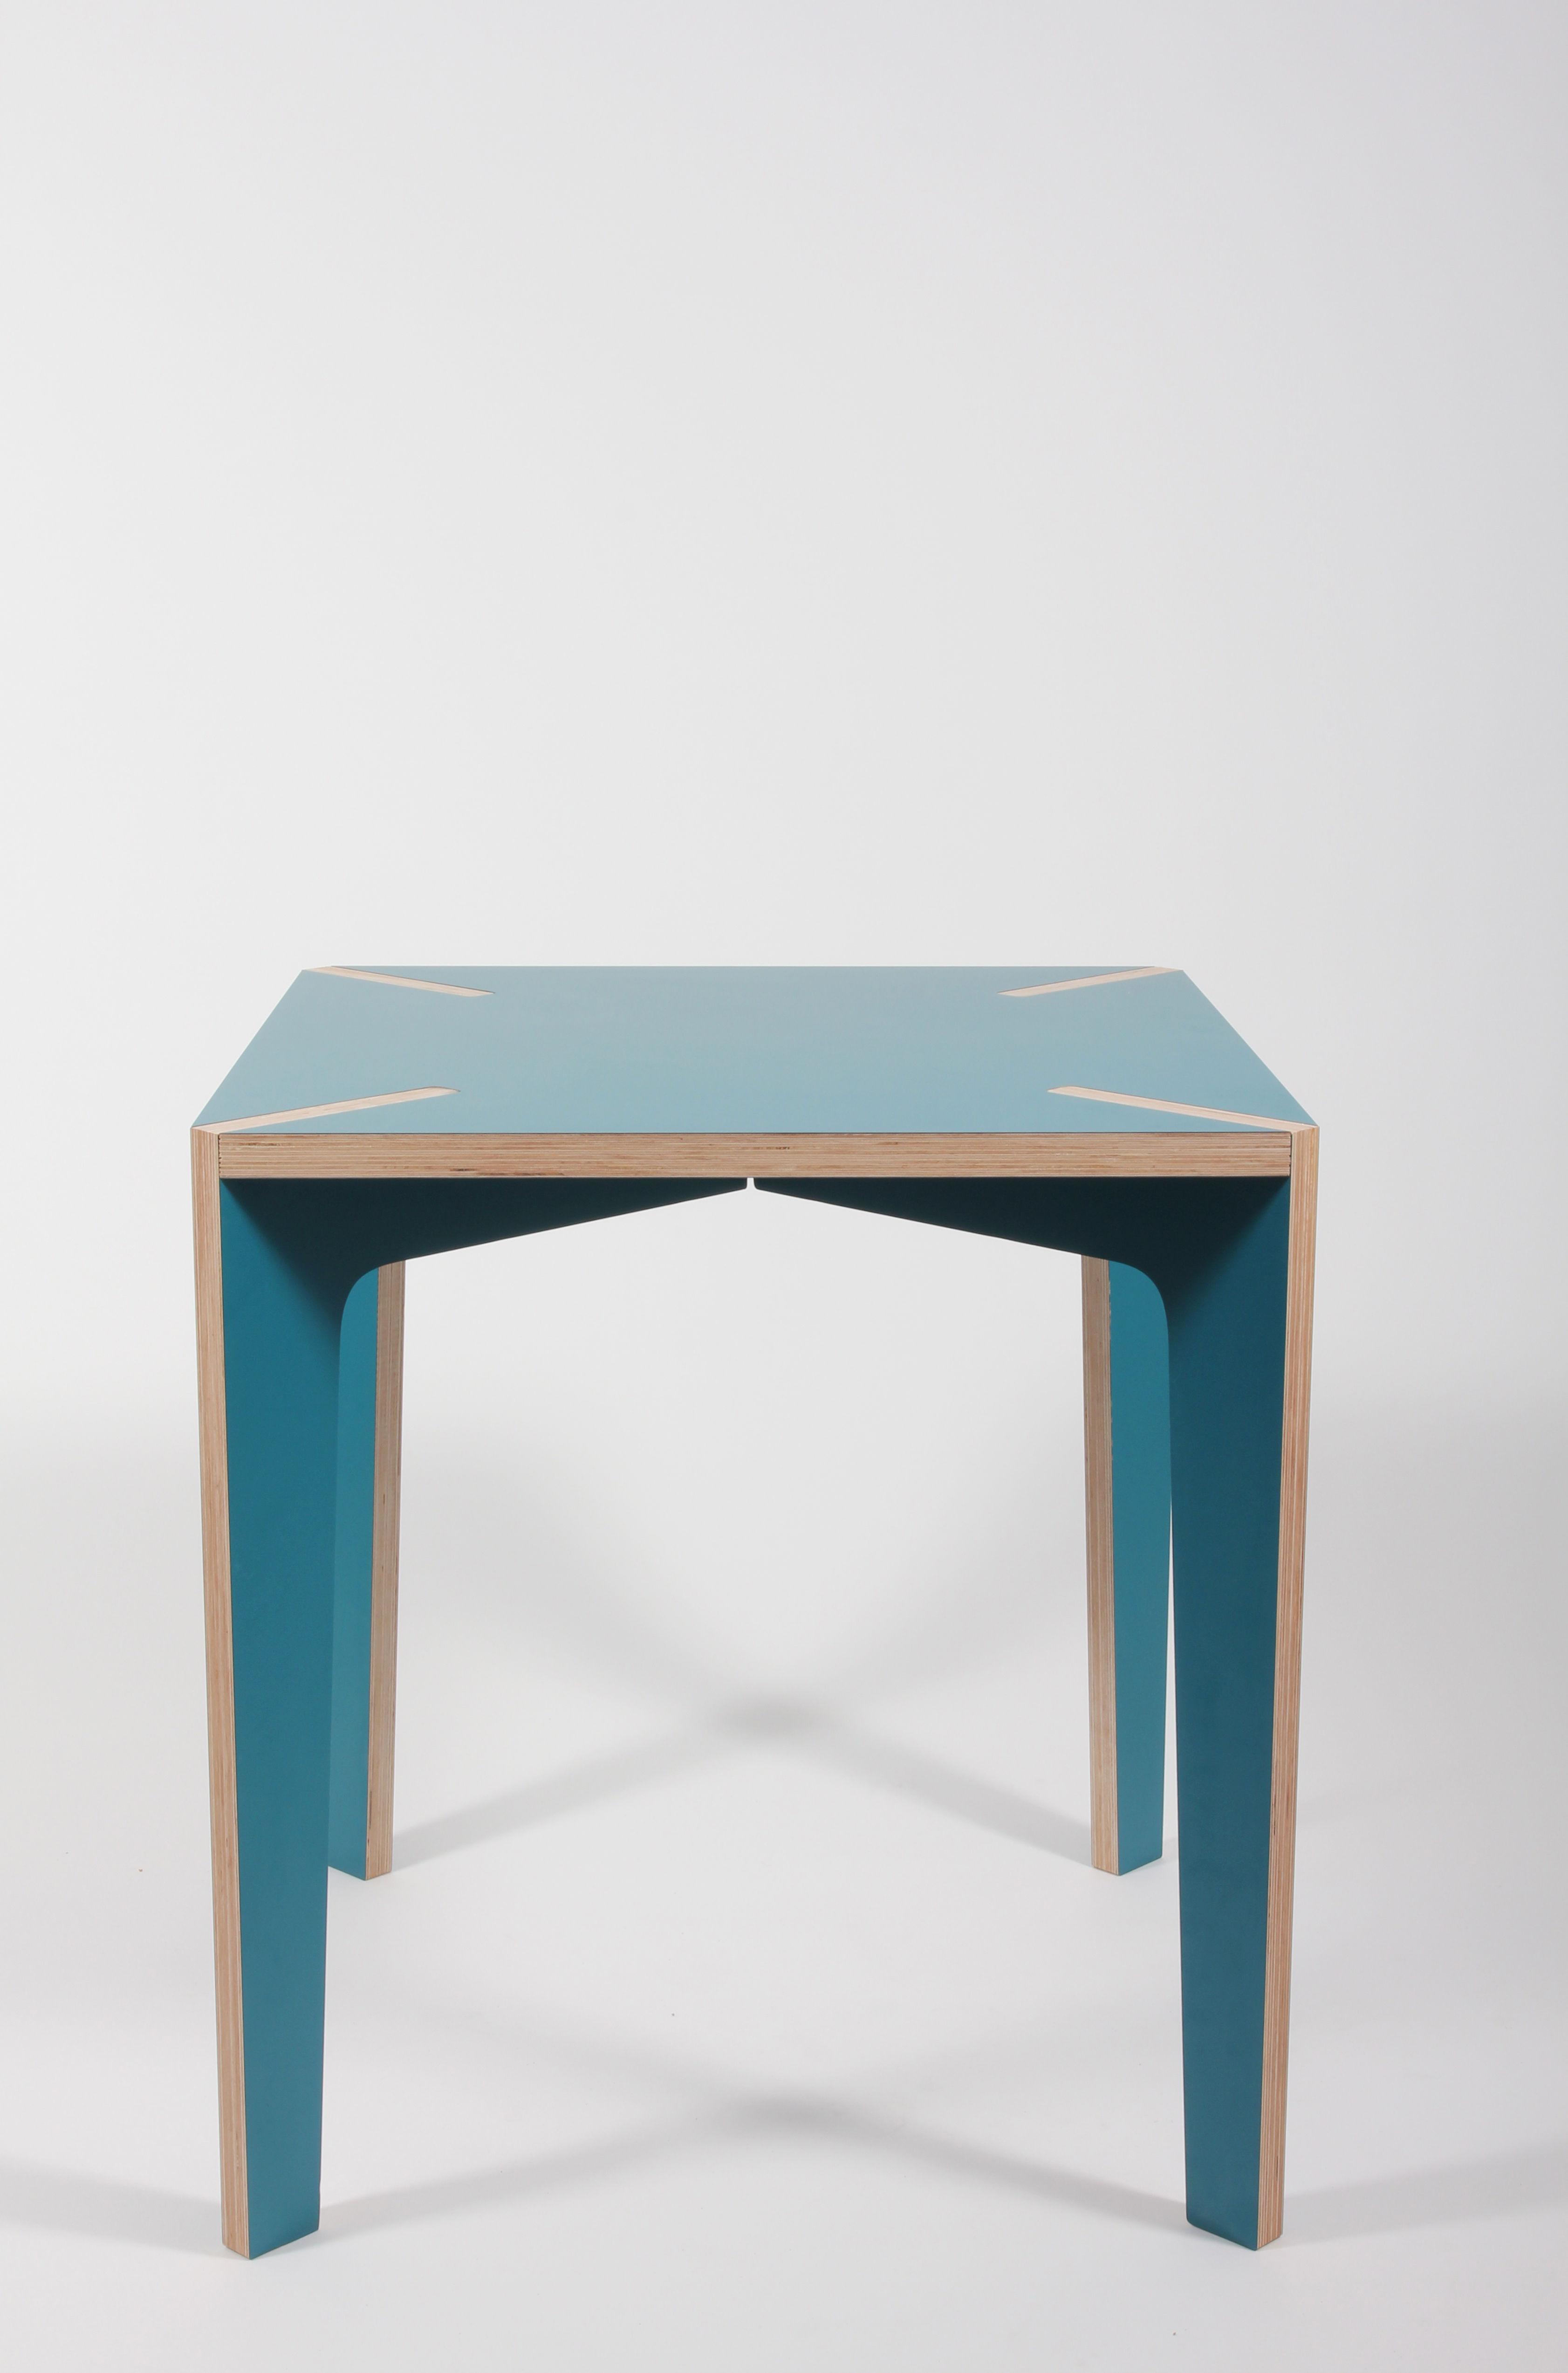 Scopri tavolo s rie x 70 x 70 cm 70 x 70 cm blu di la for Tavolo 70 x 120